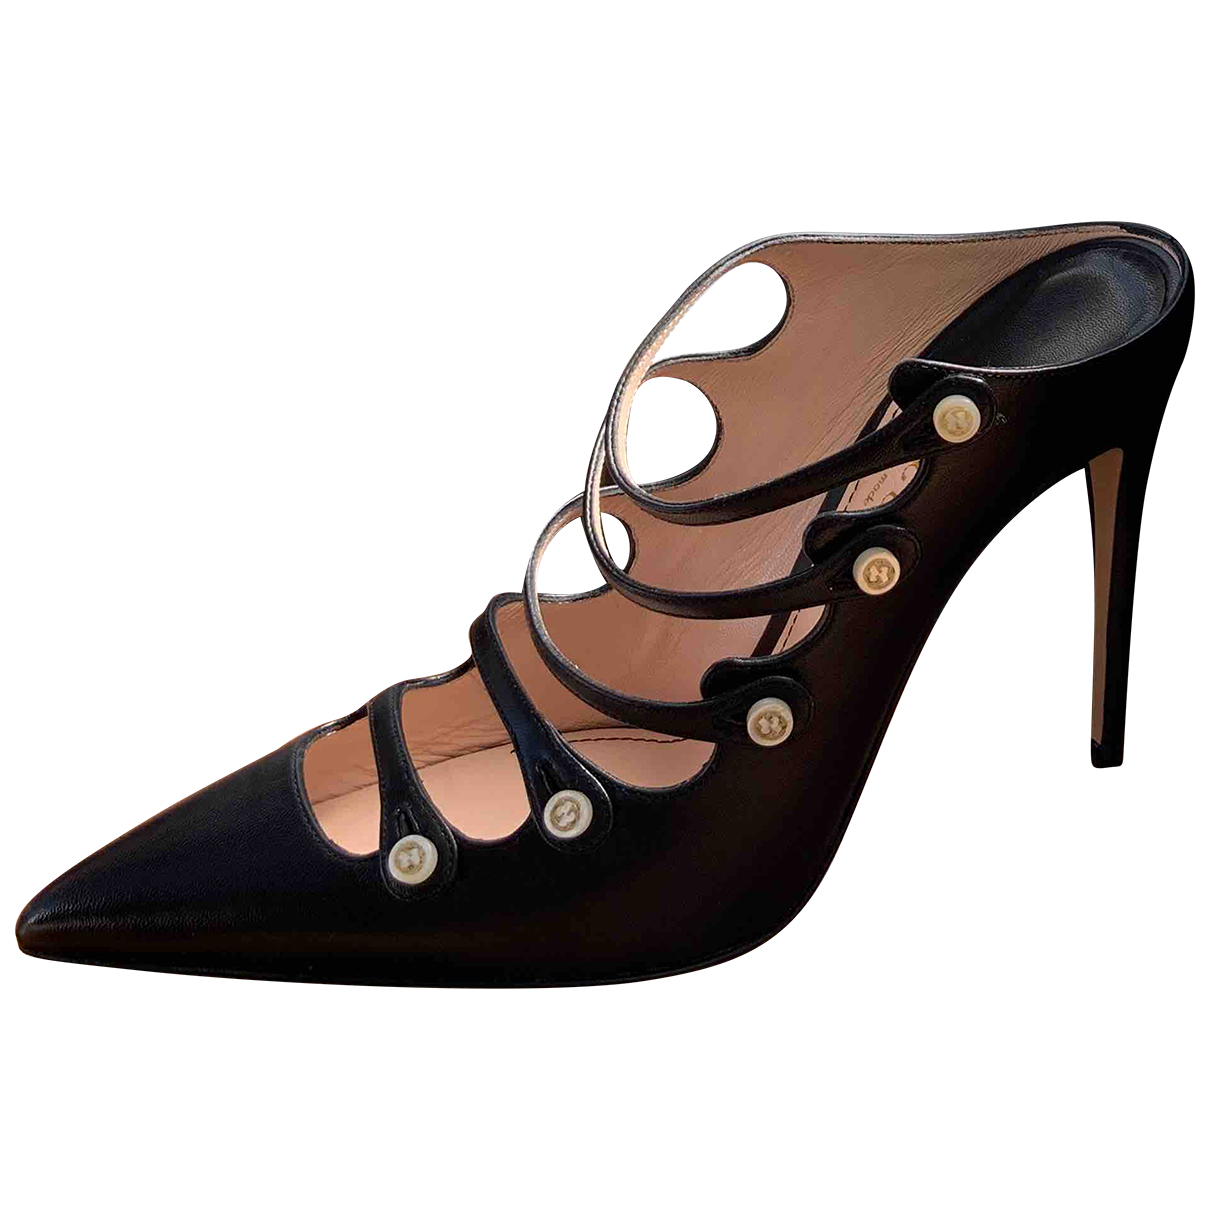 Gucci \N Black Leather Mules & Clogs for Women 37 EU